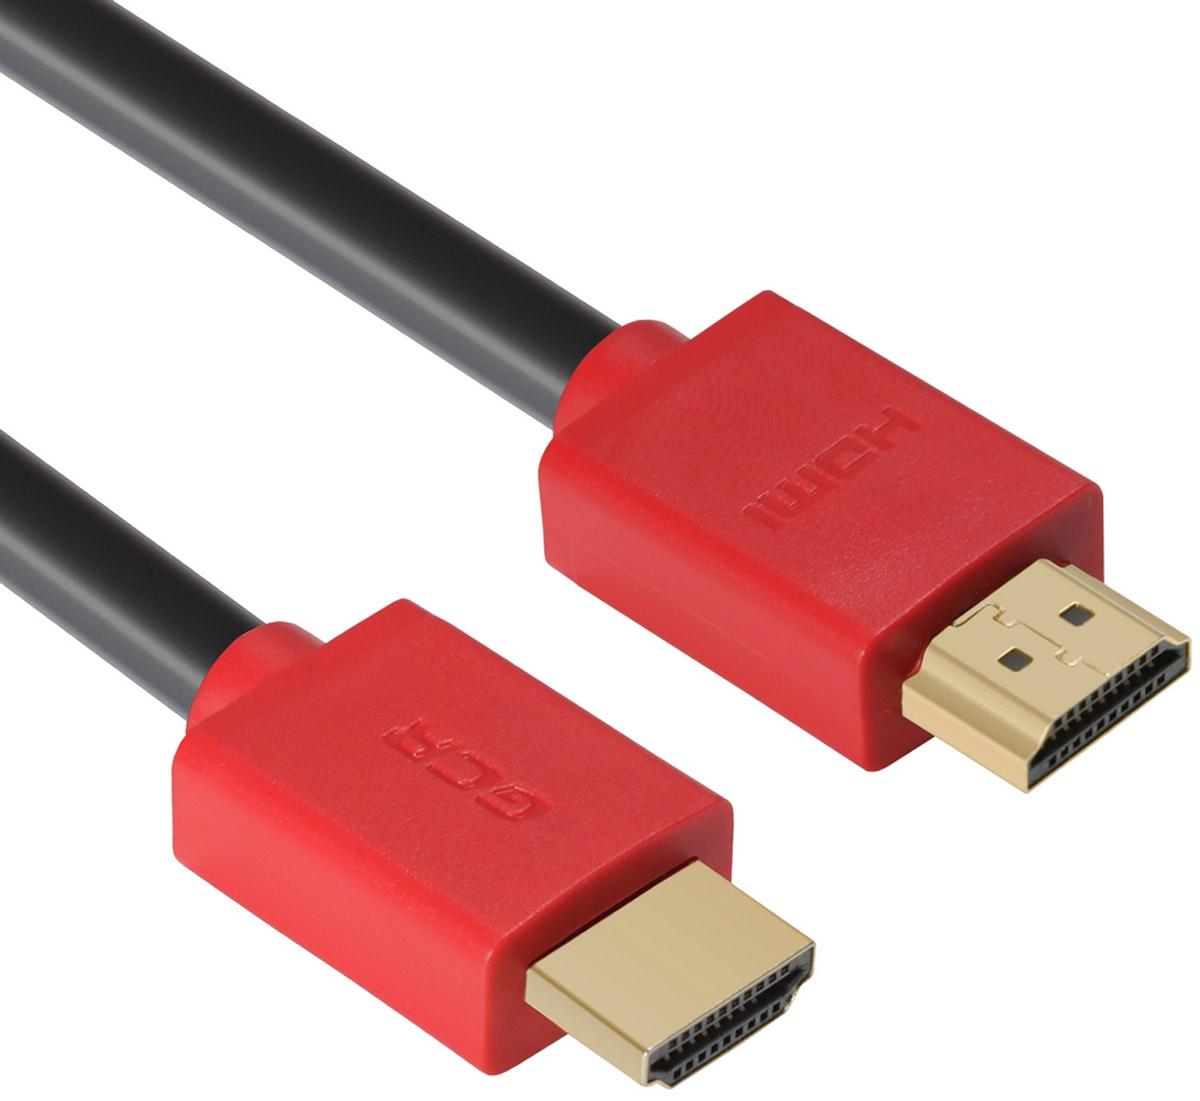 Фото - Кабель Greenconnect HDMI 2.0, GCR-HM451-3.0m, HDR 4:2:2, UltraHD, 4K 60Hz/5K*30Hz, 3D, AUDIO, 28 AWG, 3х экран, 3.0m аксессуар mobiledata hdmi 4k v 2 0 плоский 1 8m hdmi 2 0 fn 1 8